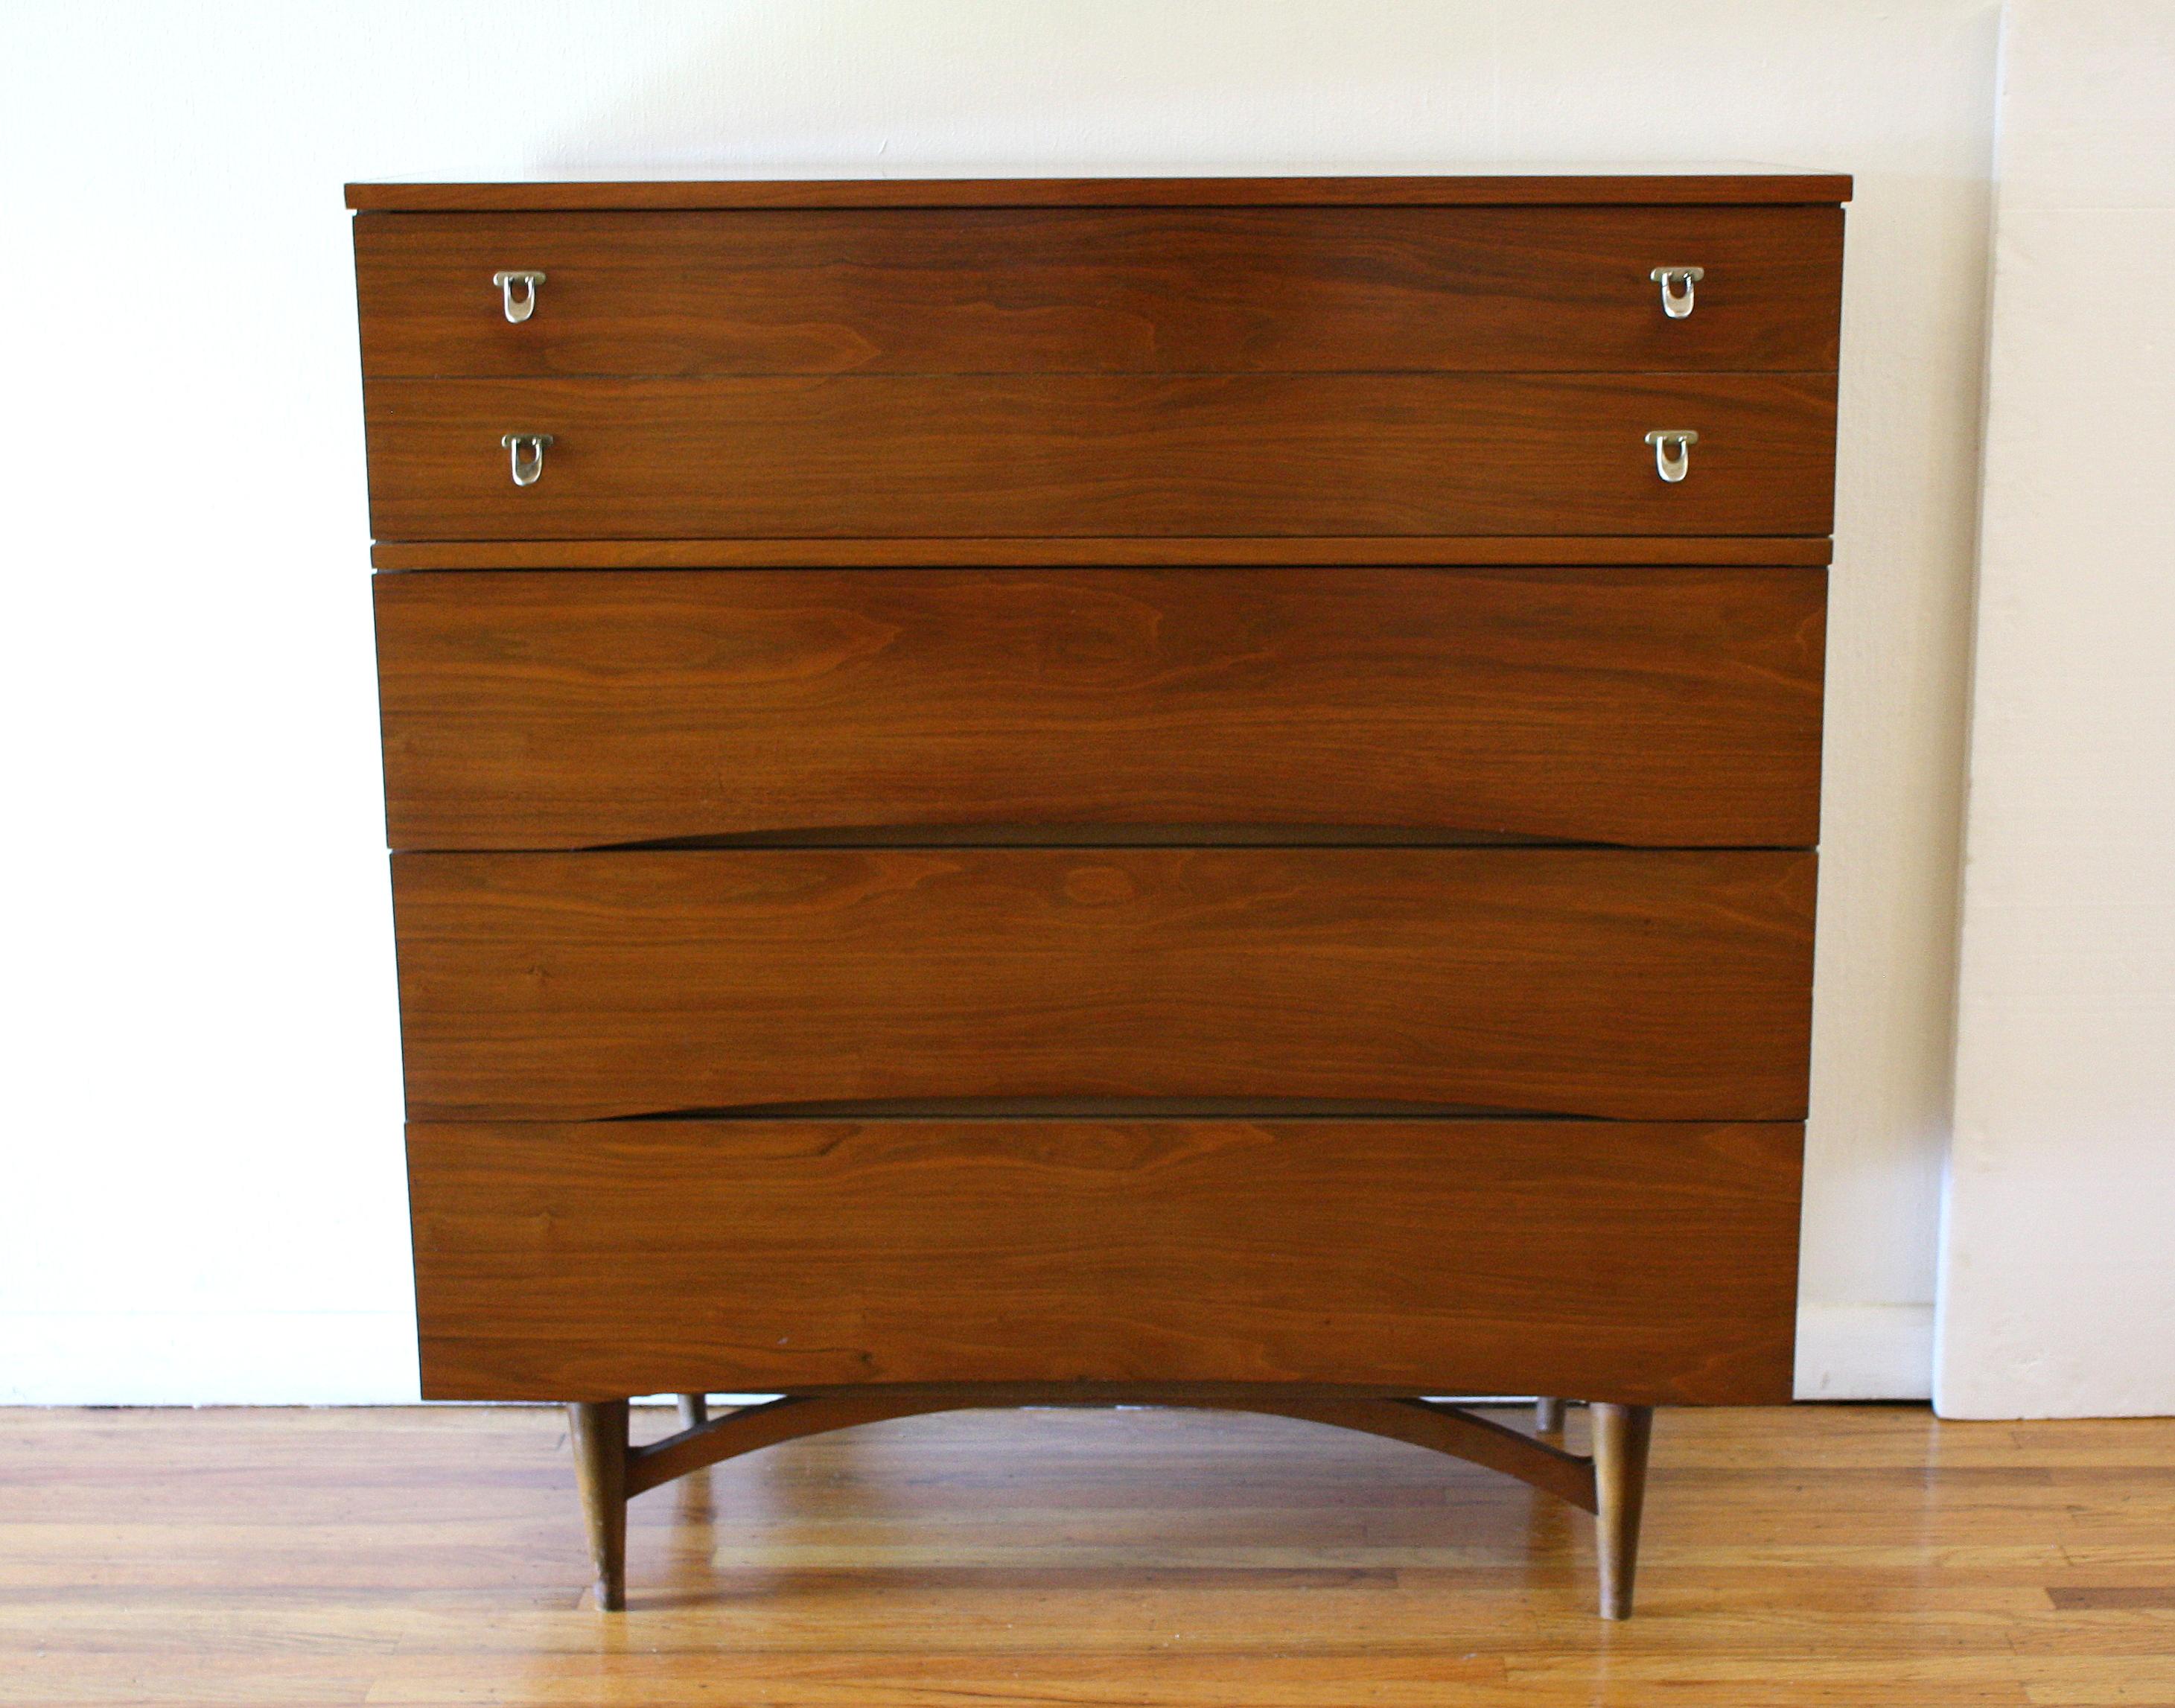 Mcm tall dresser arched design 1